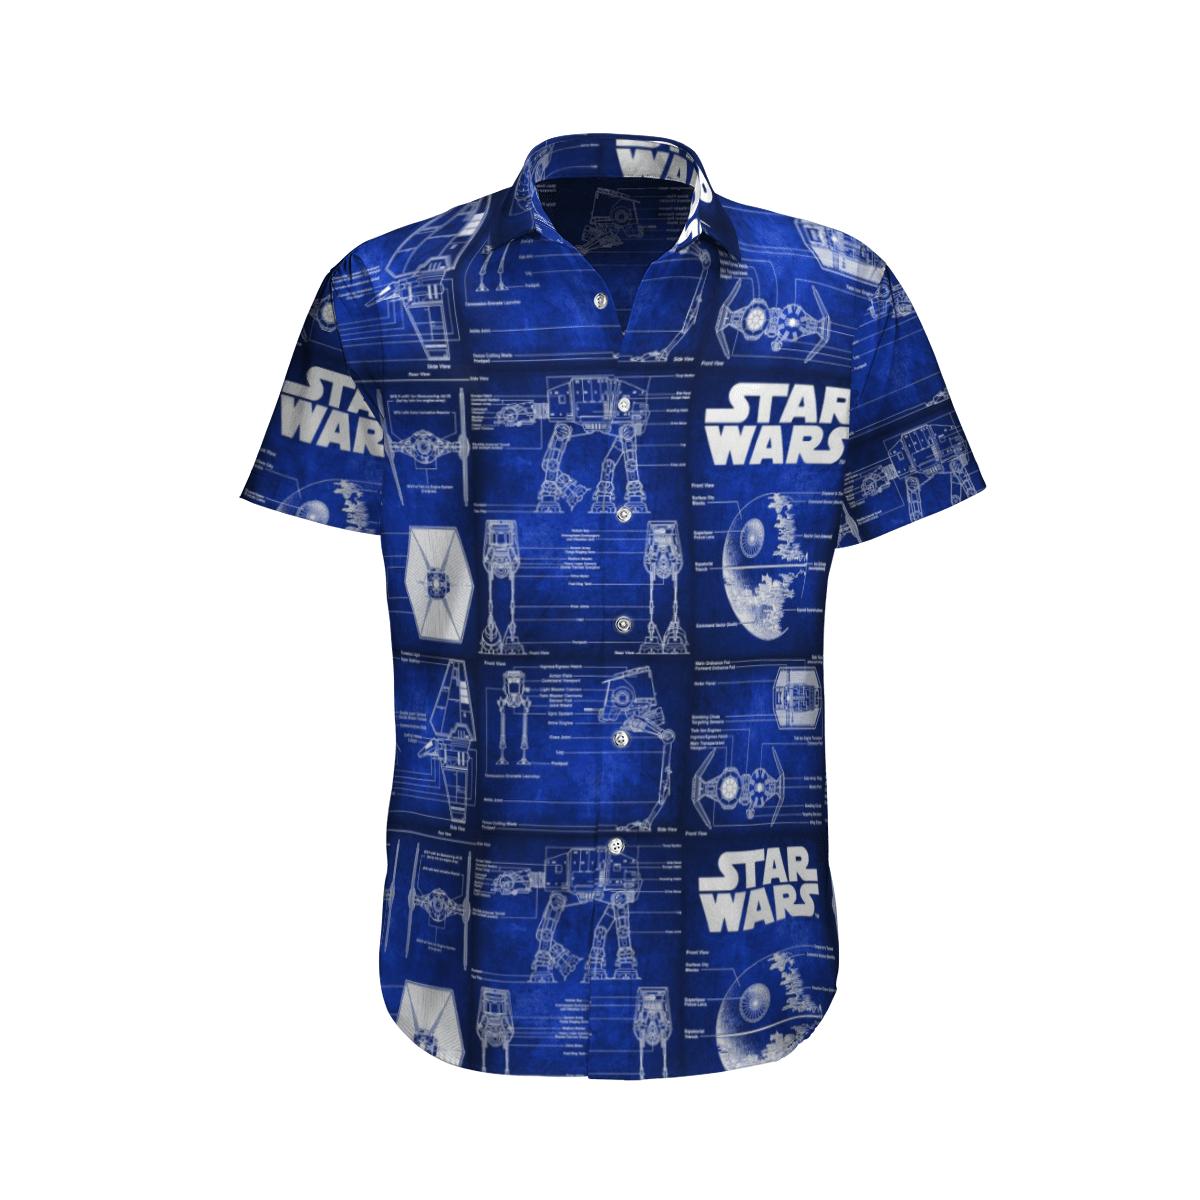 Star wars Detailed Structure of Spaceship Scan Hawaiian Shirt